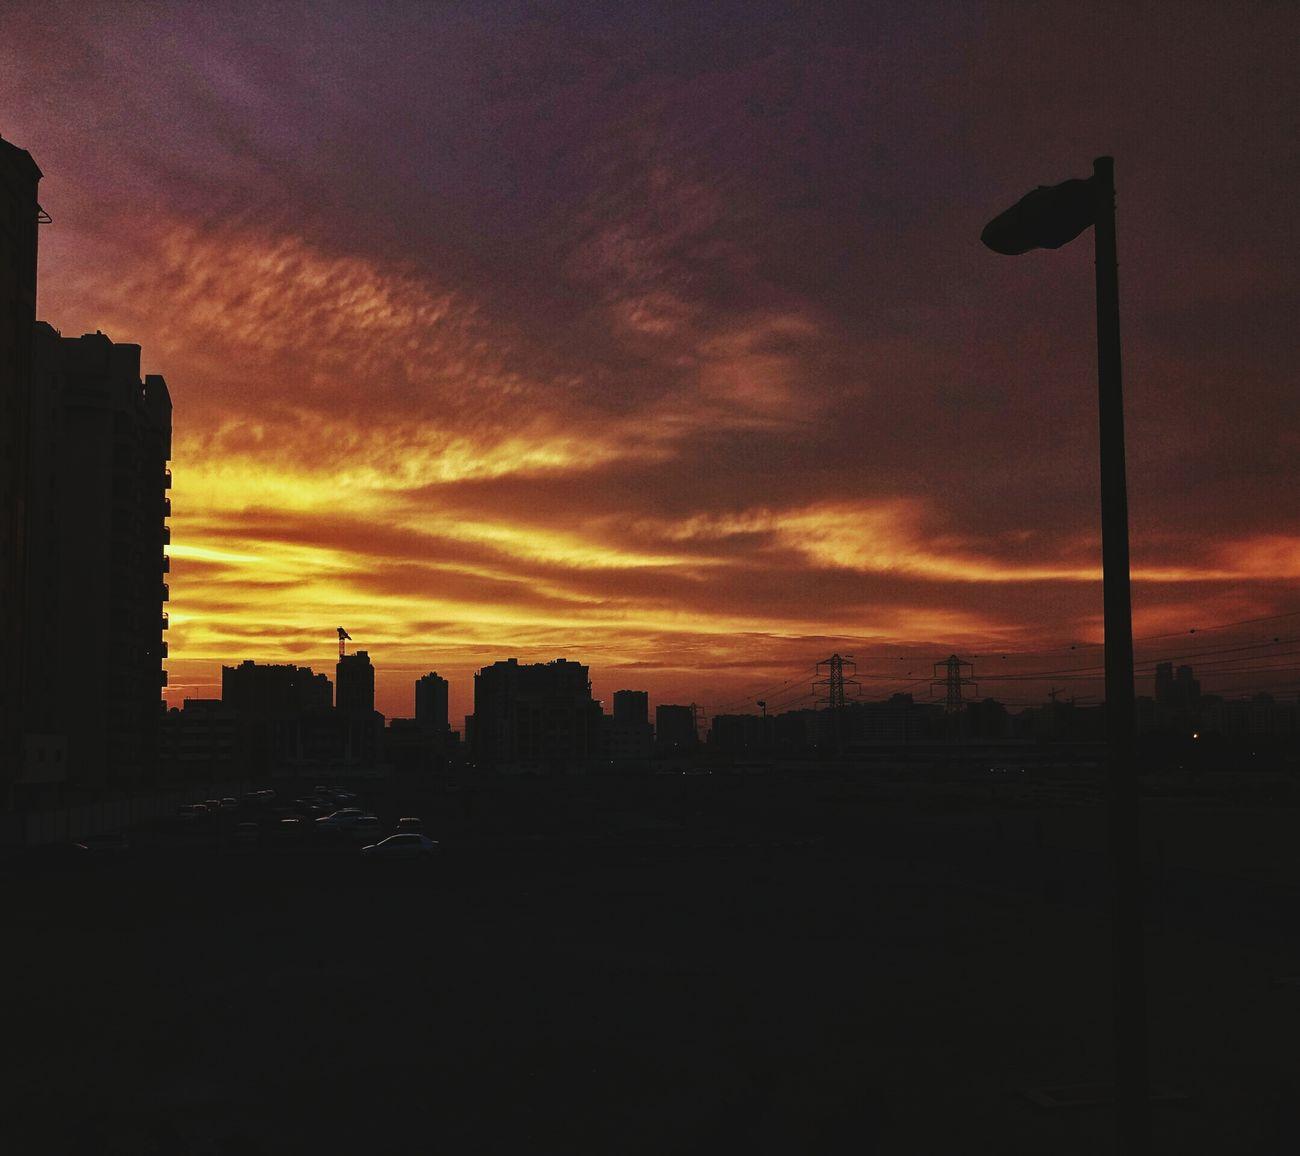 Sky Sunset Cloud - Sky Cityscape No People Outdoors Nature Sunlight Sunshine ☀ Dubai DXB Mobilephotography Sony Xperia Photography. Xperiaxaultra The Street Photographer - 2017 EyeEm Awards